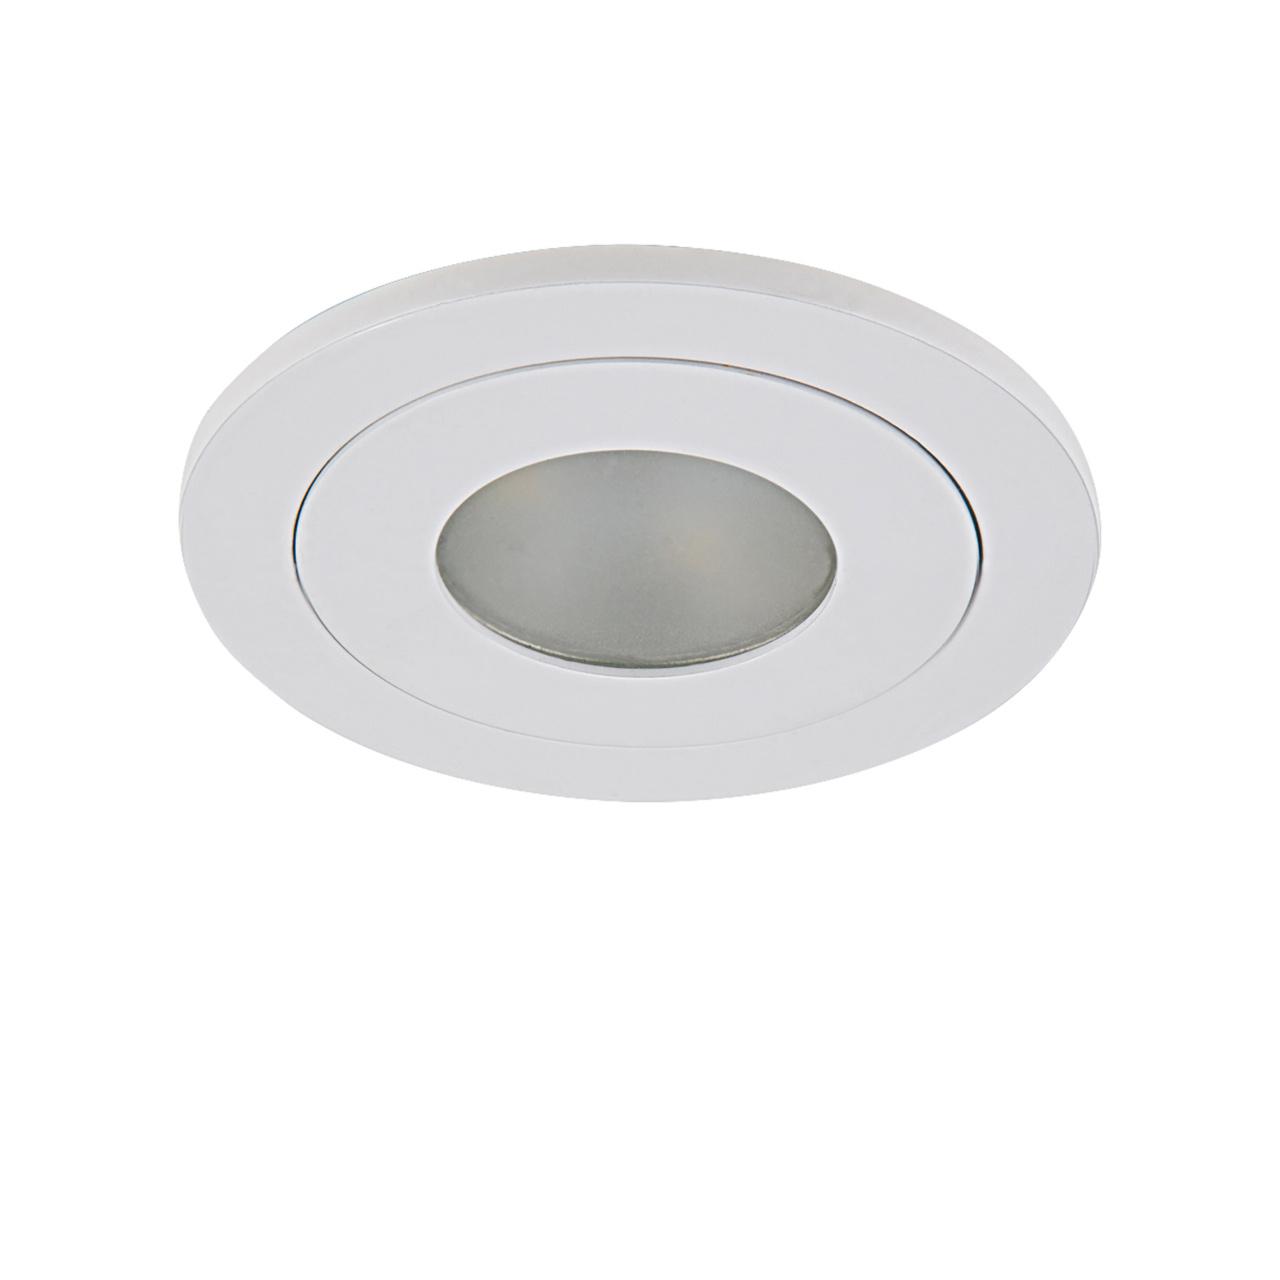 Светильник Leddy cyl LED 3W 240LM белый 4000K Lightstar 212176